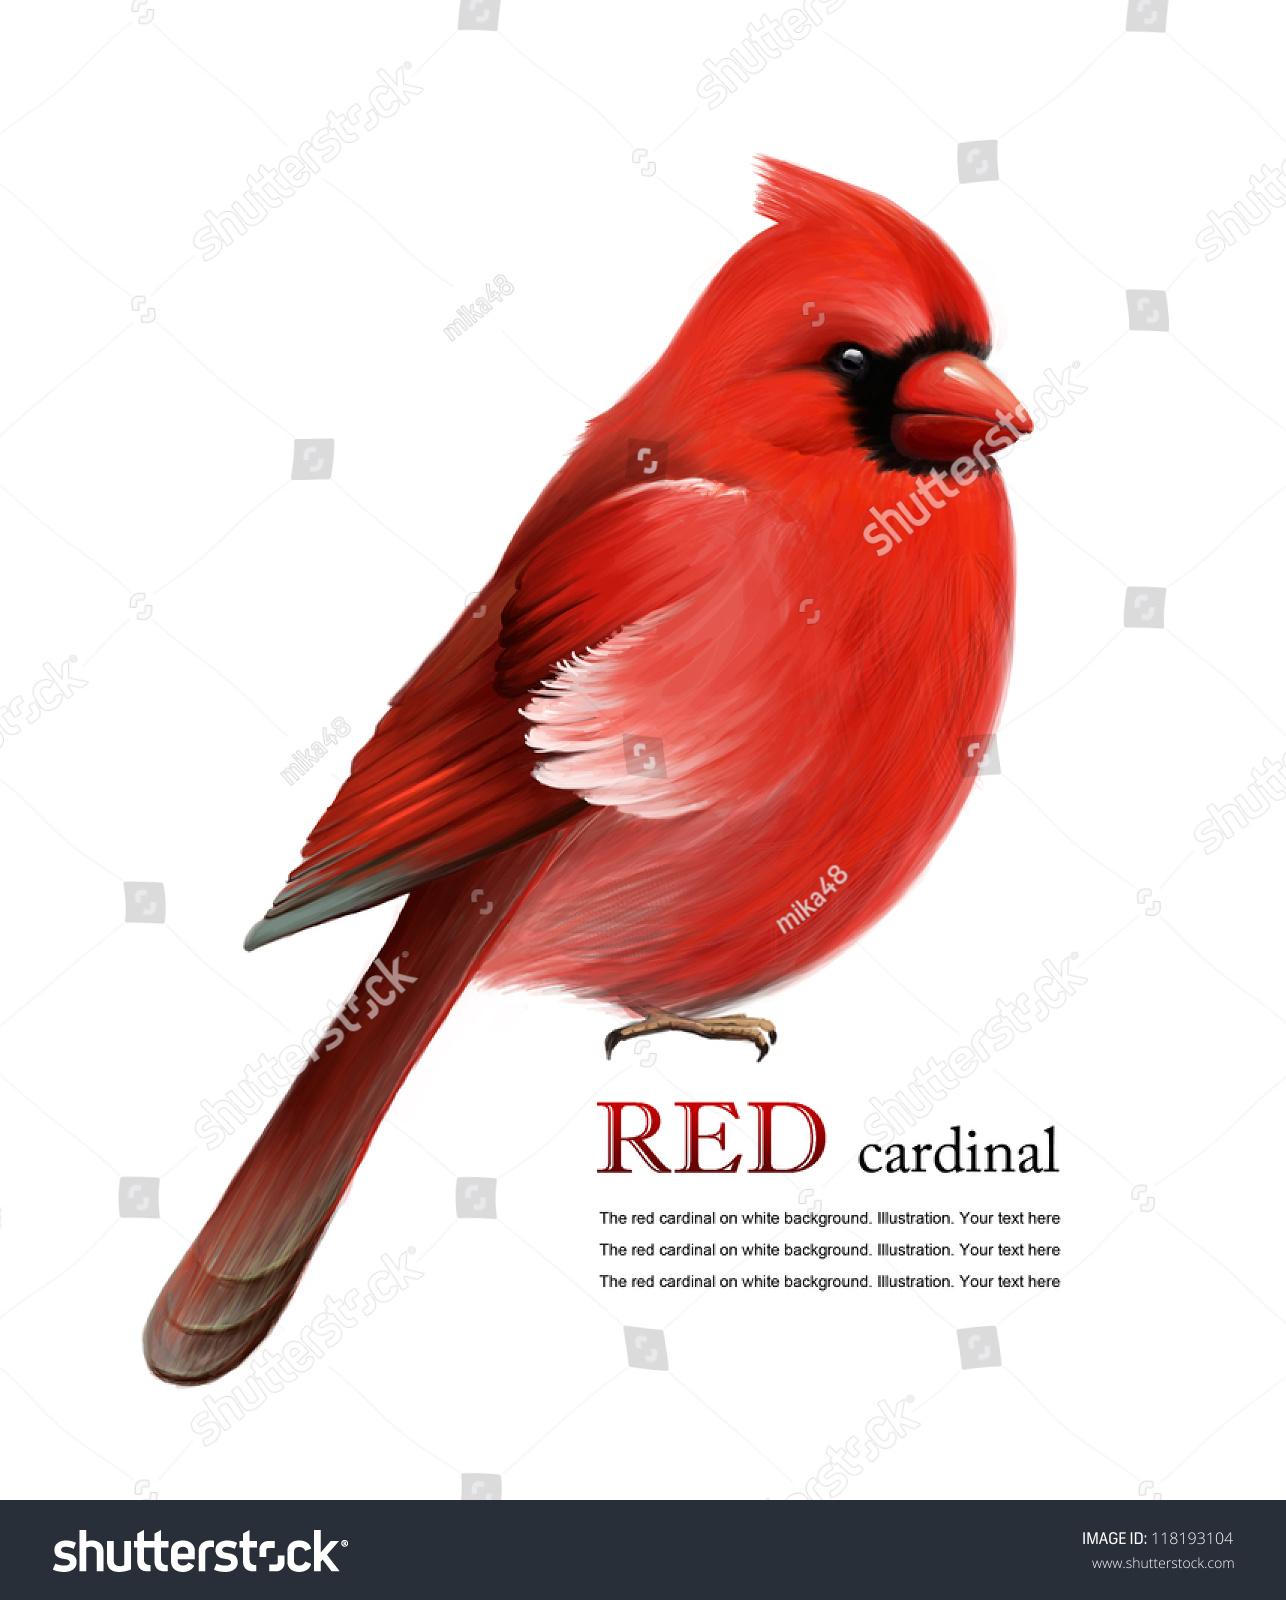 Red Cardinal On White Background Illustration Stock Illustration